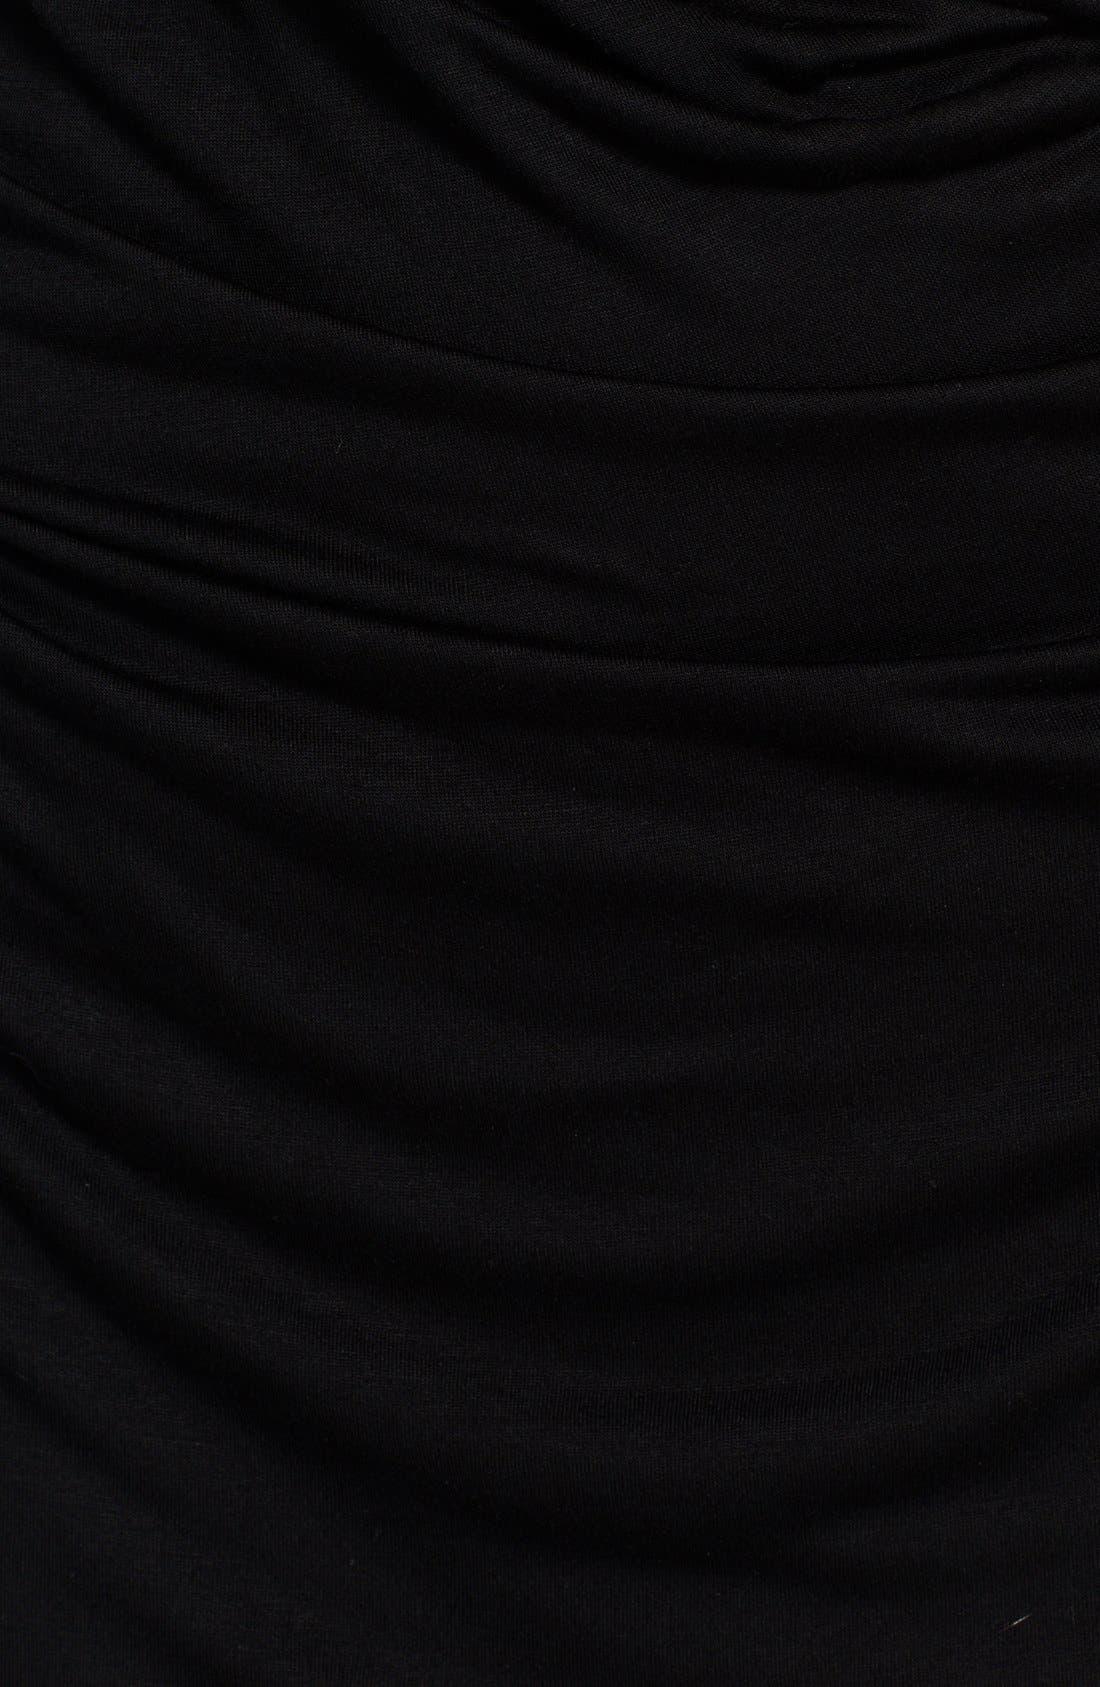 Alternate Image 3  - Helmut Lang 'Scala' Draped Crossover Back Jersey Dress